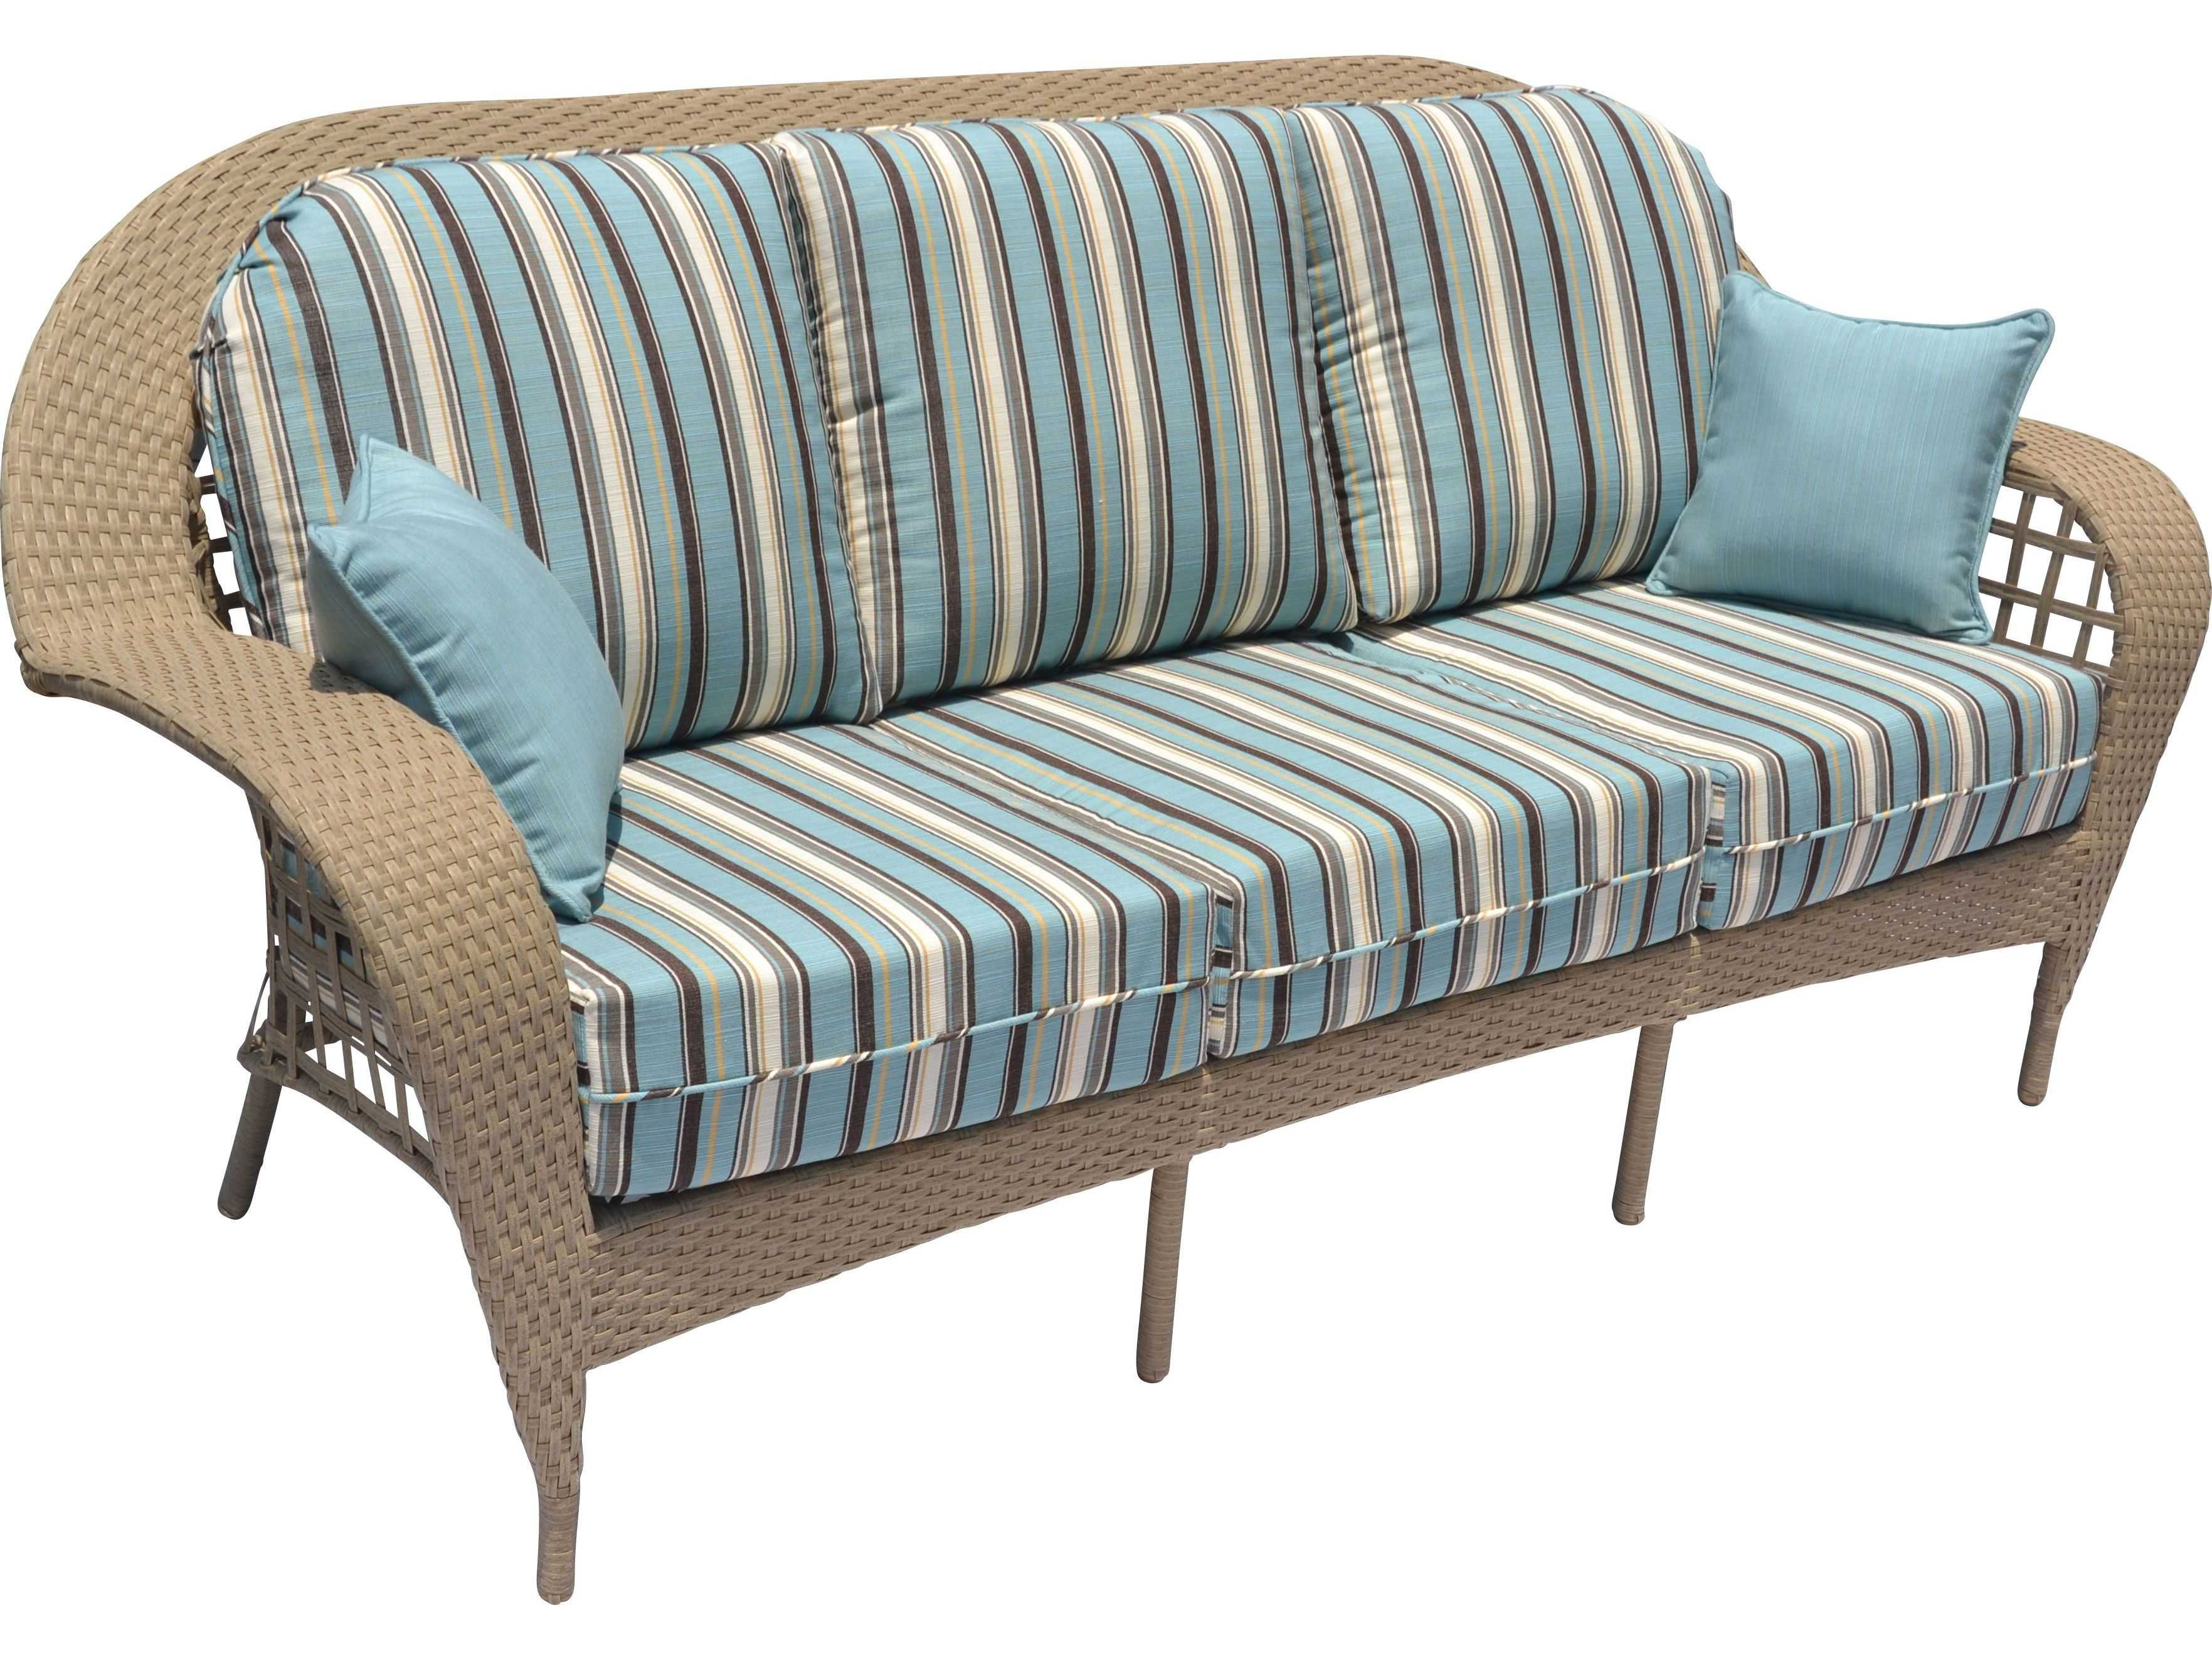 Suncoast Sedona Wicker Sofa